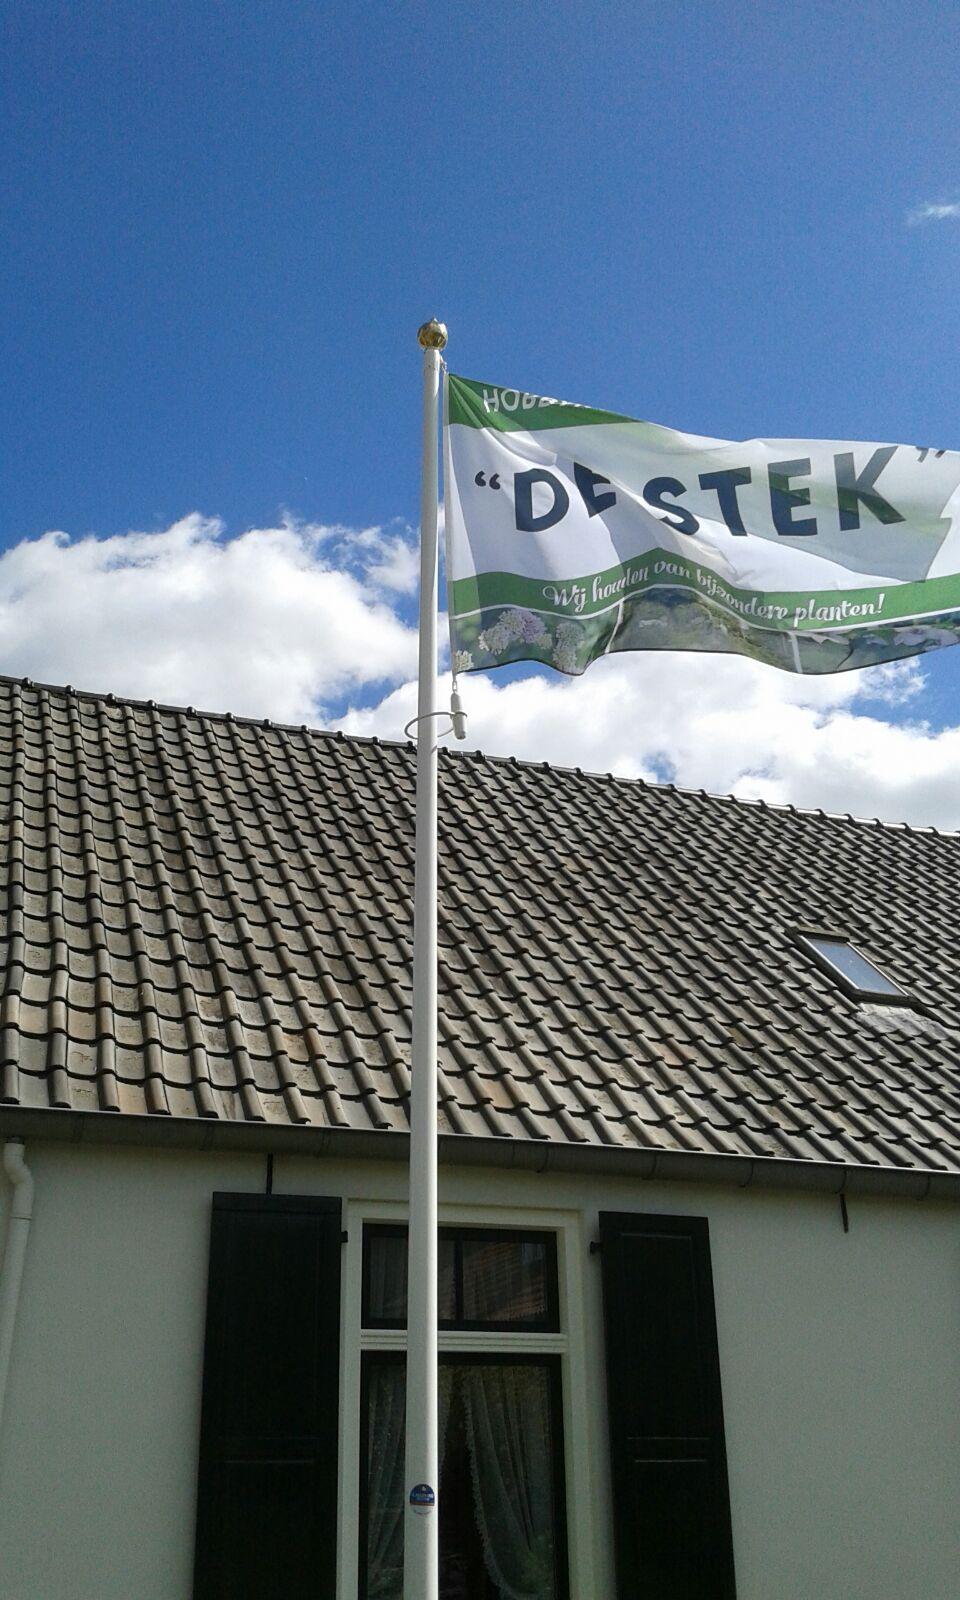 De Stek hobbykwekerij en kijktuin - Vlag